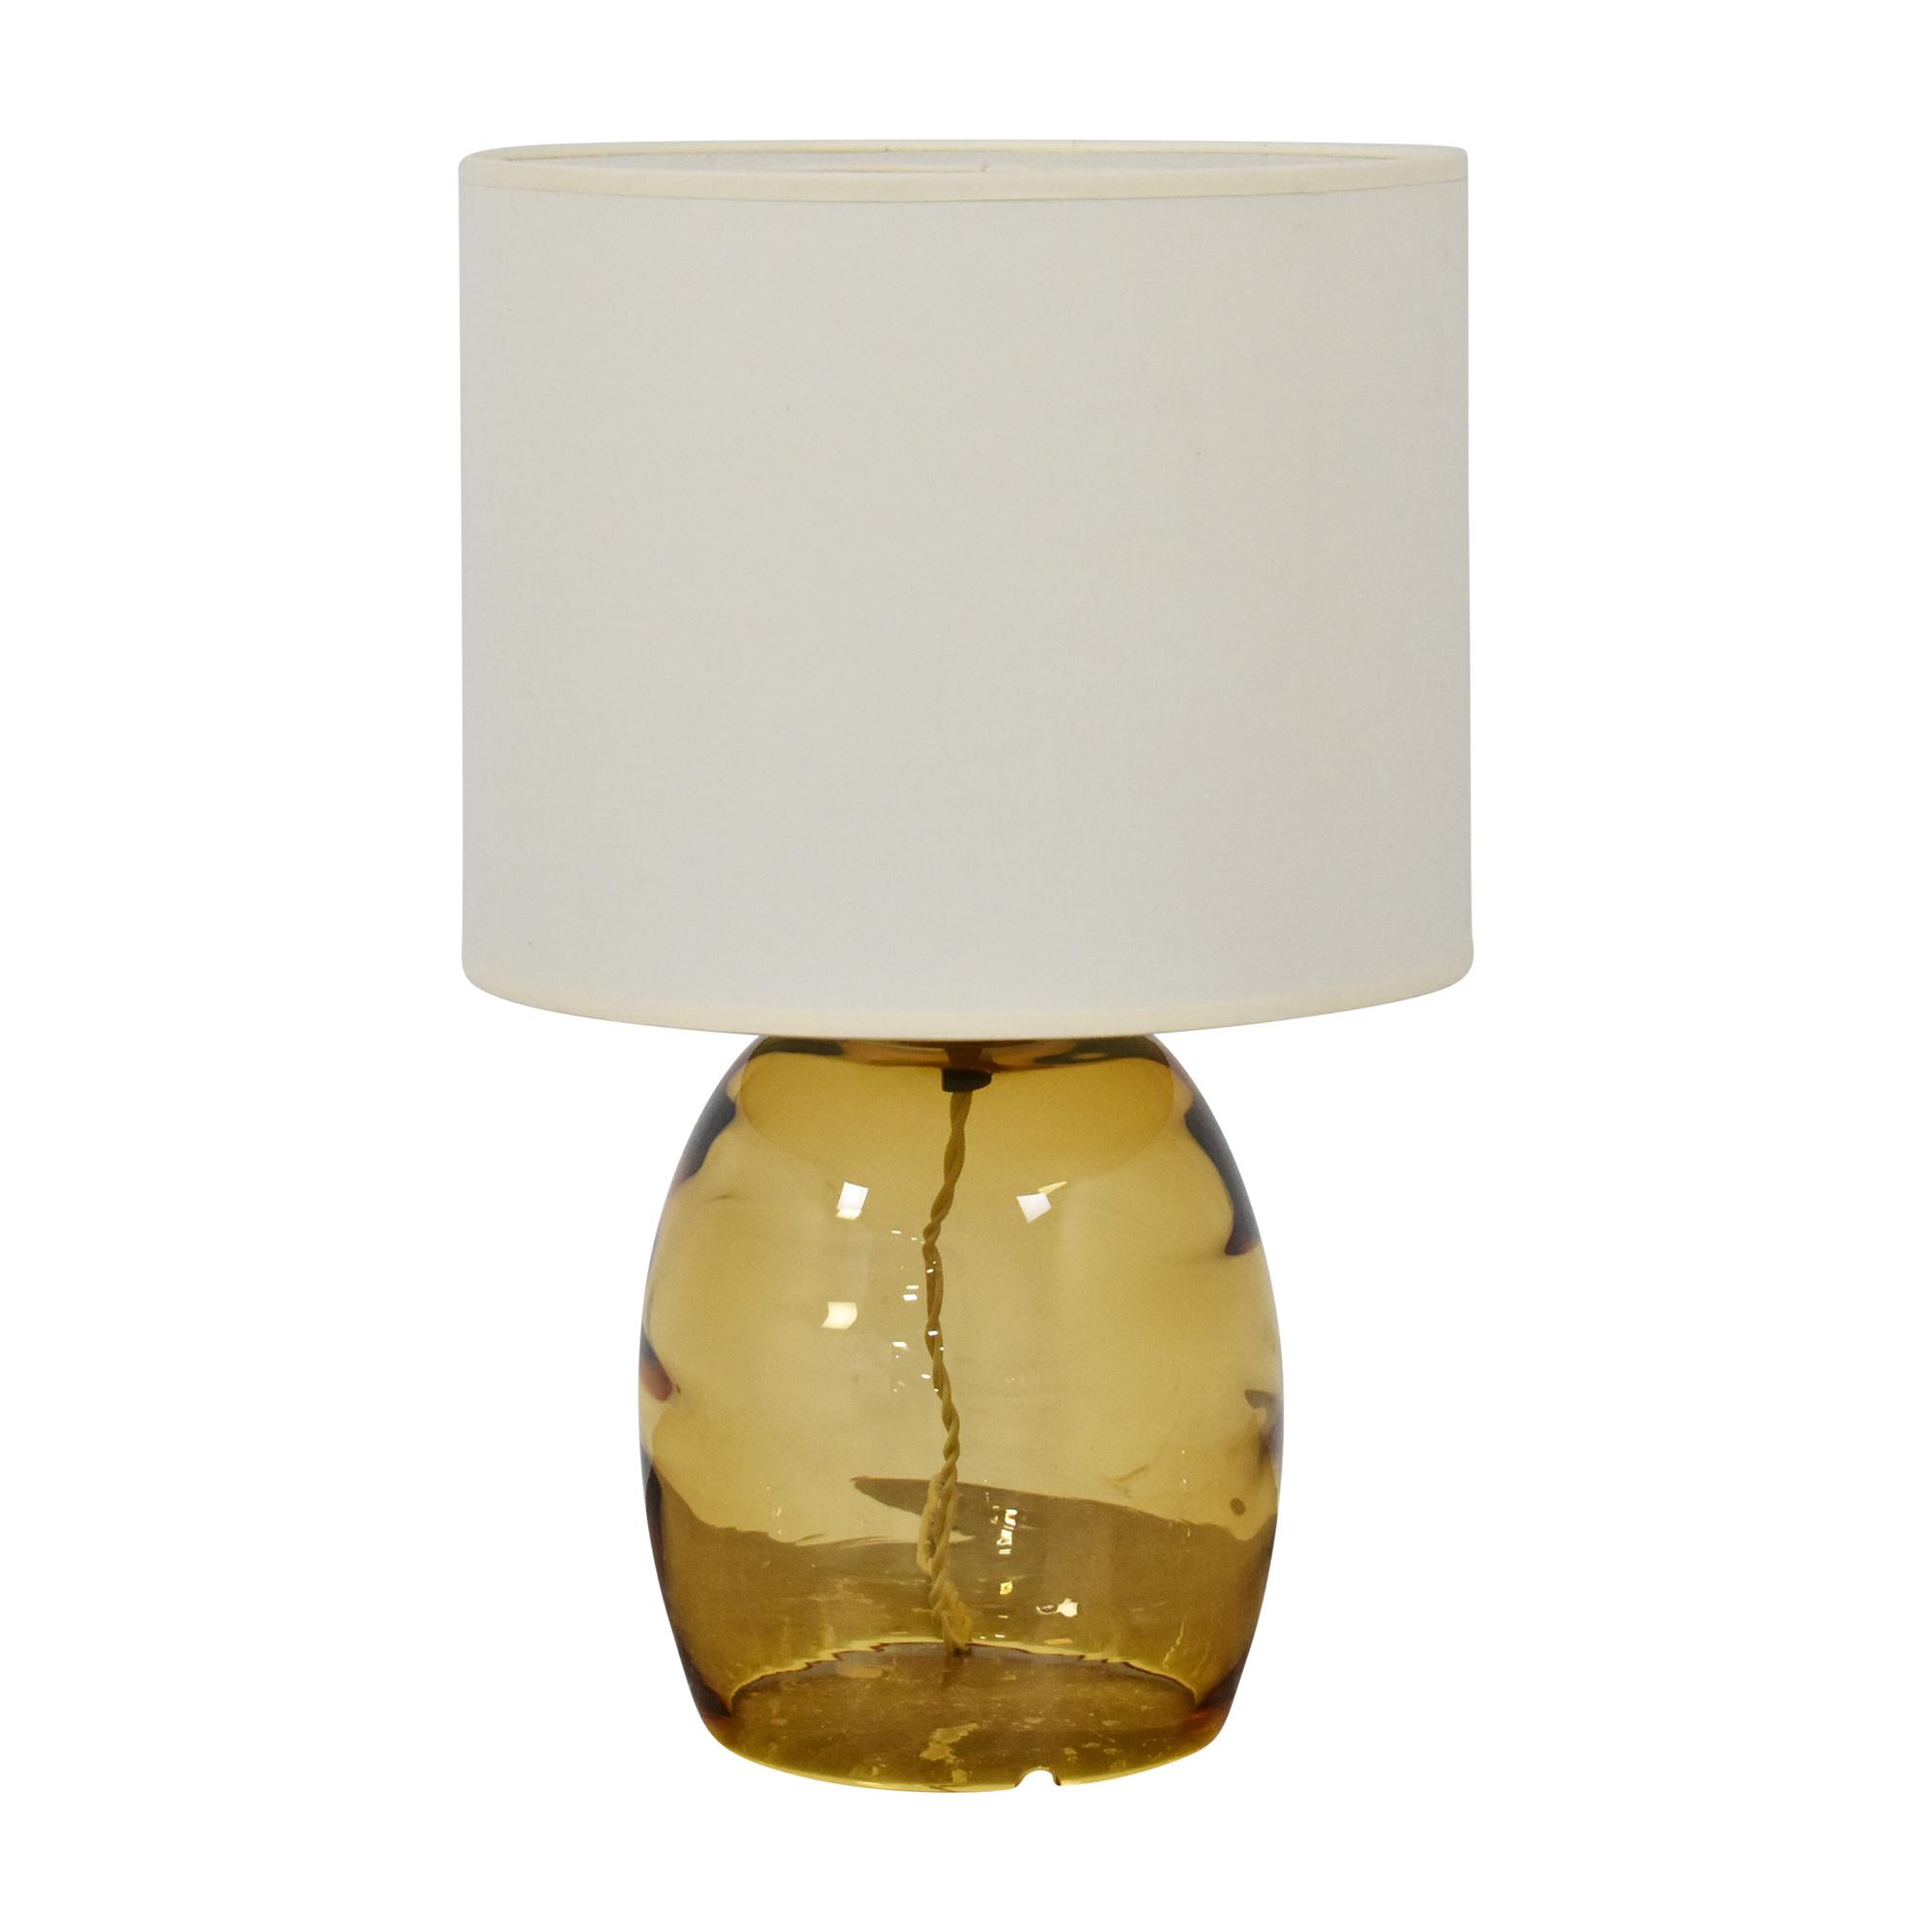 Room & Board Room & Board Grace Table Lamp price